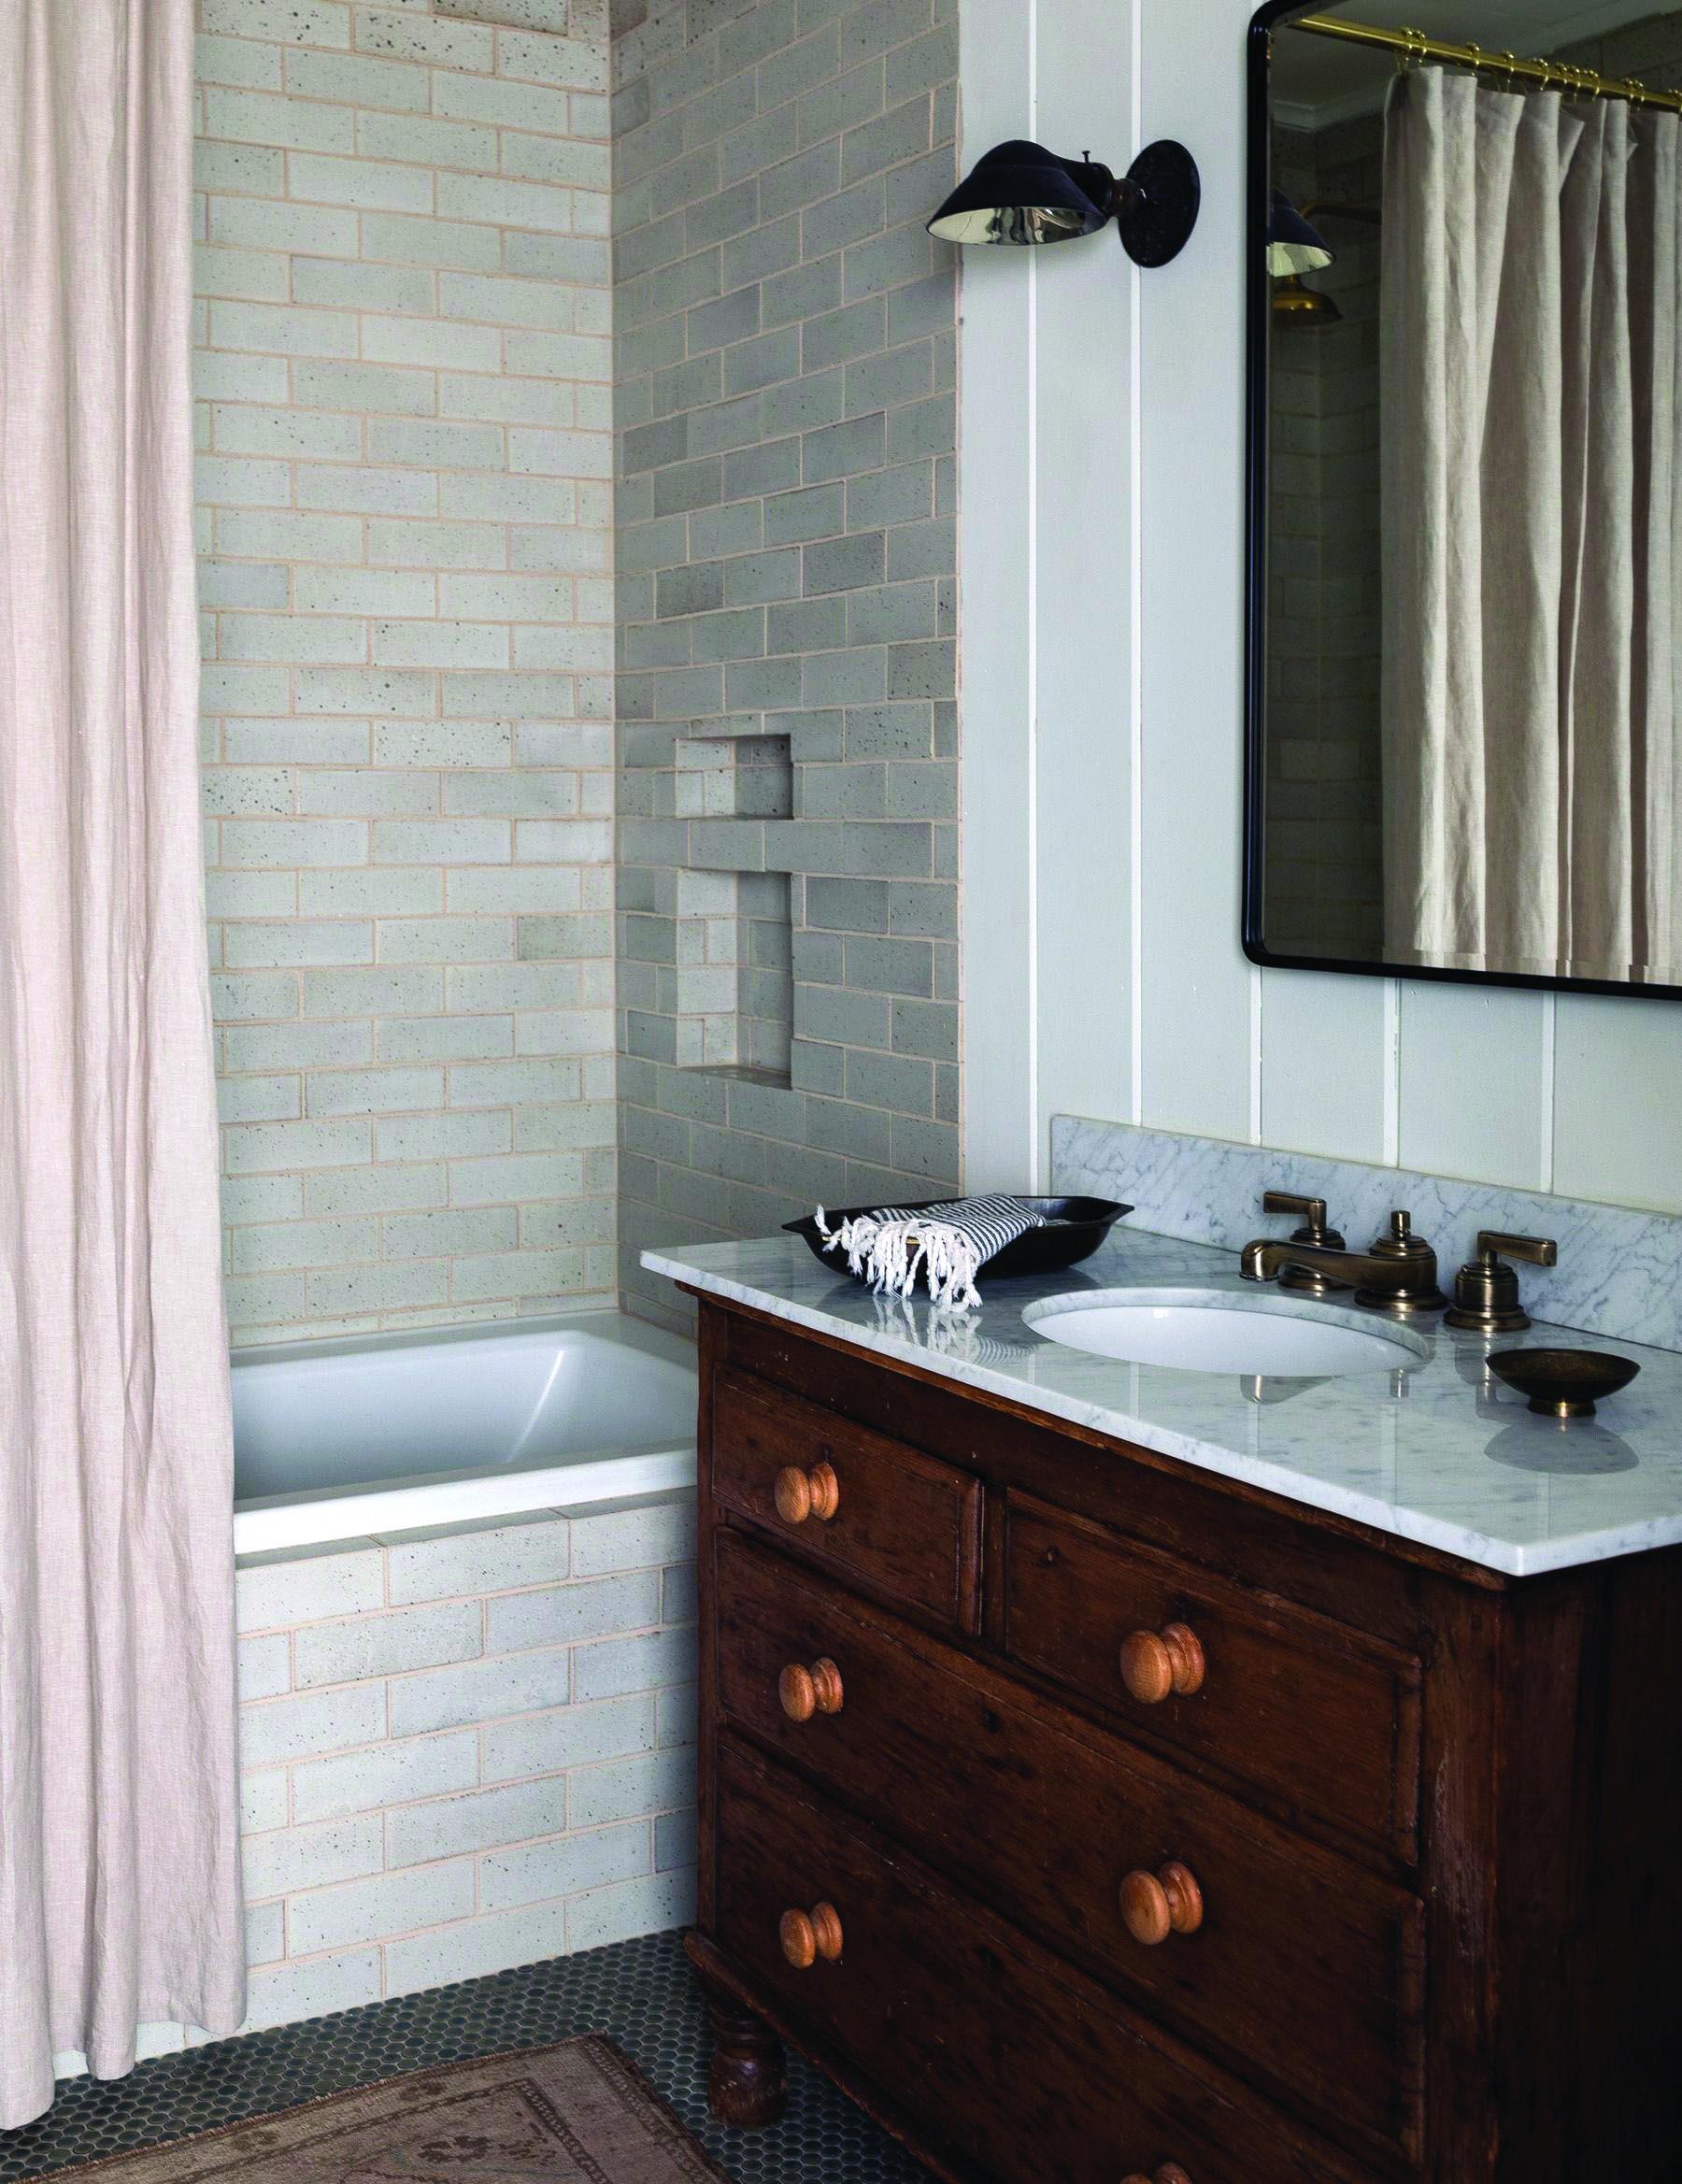 New Ways To Make Use Of Learn Flooring Ceramic Tile In Your Shower Room Dova Home Bathroom Vanity Designs Trendy Bathroom Bathroom Inspiration